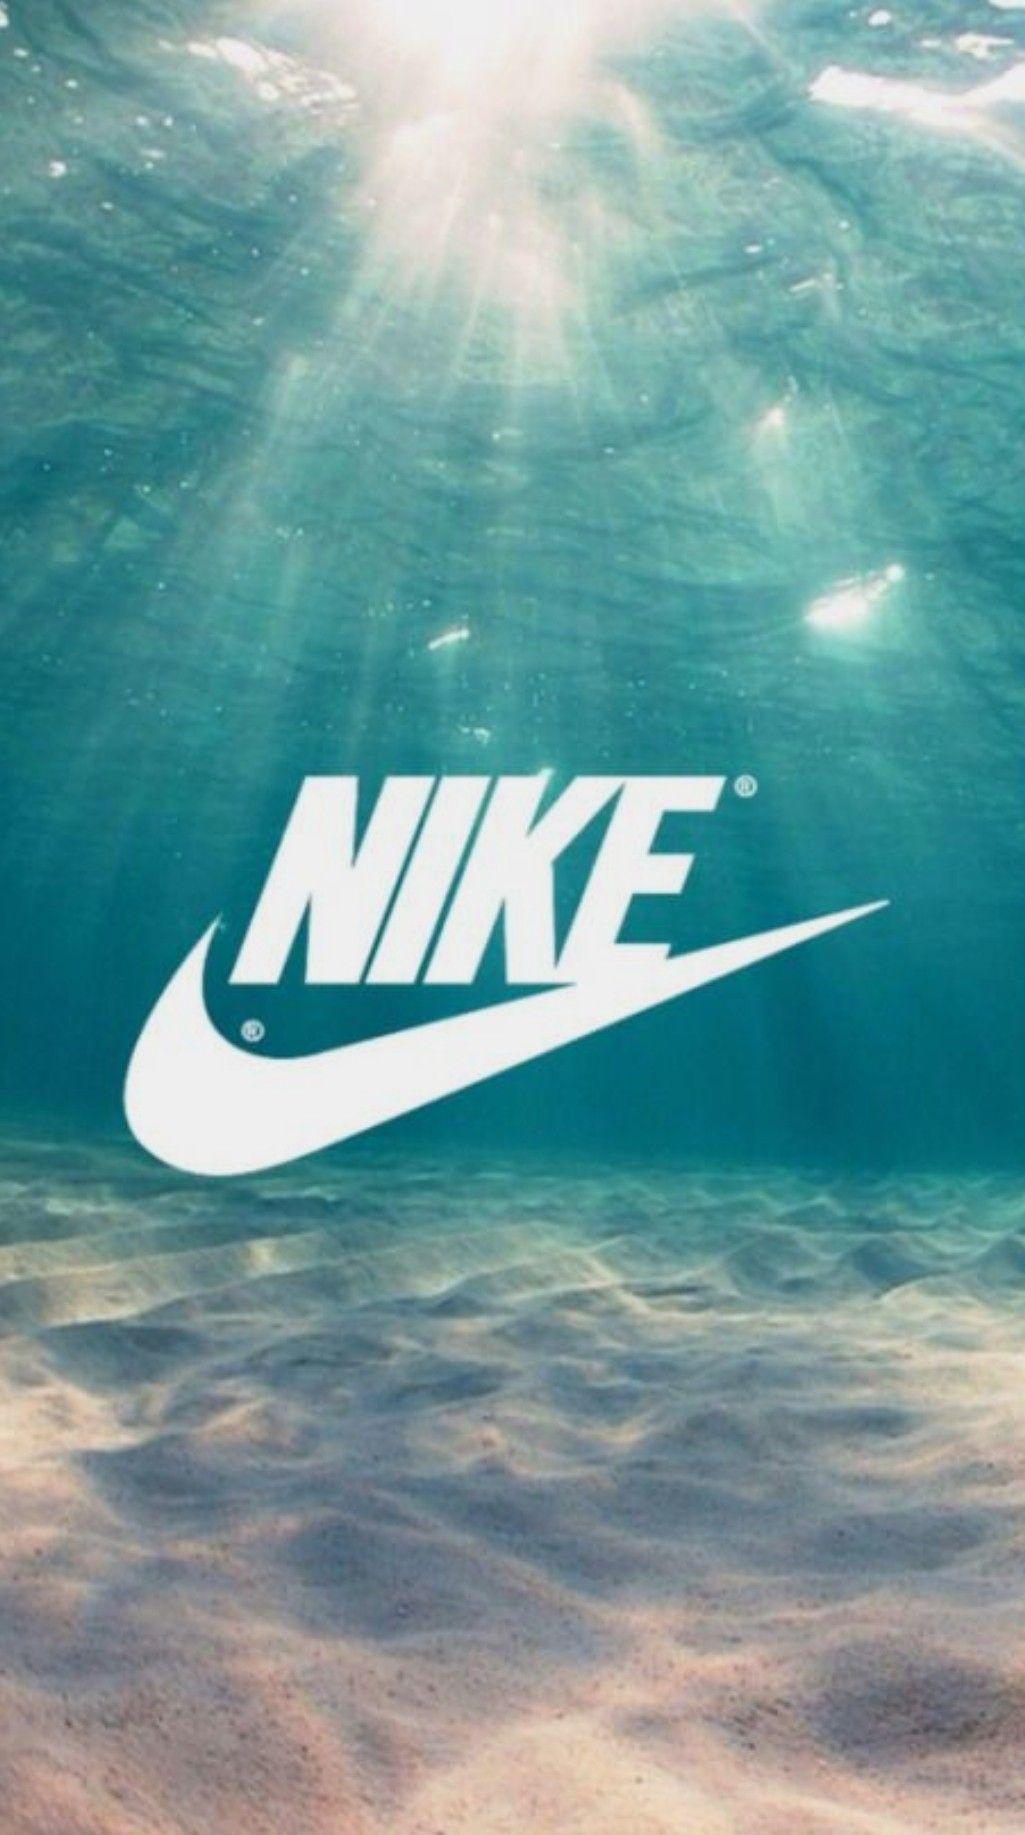 Cute Ocean Nike Phone Wallpaper In 2020 Nike Wallpaper Iphone Nike Wallpaper Nike Logo Wallpapers